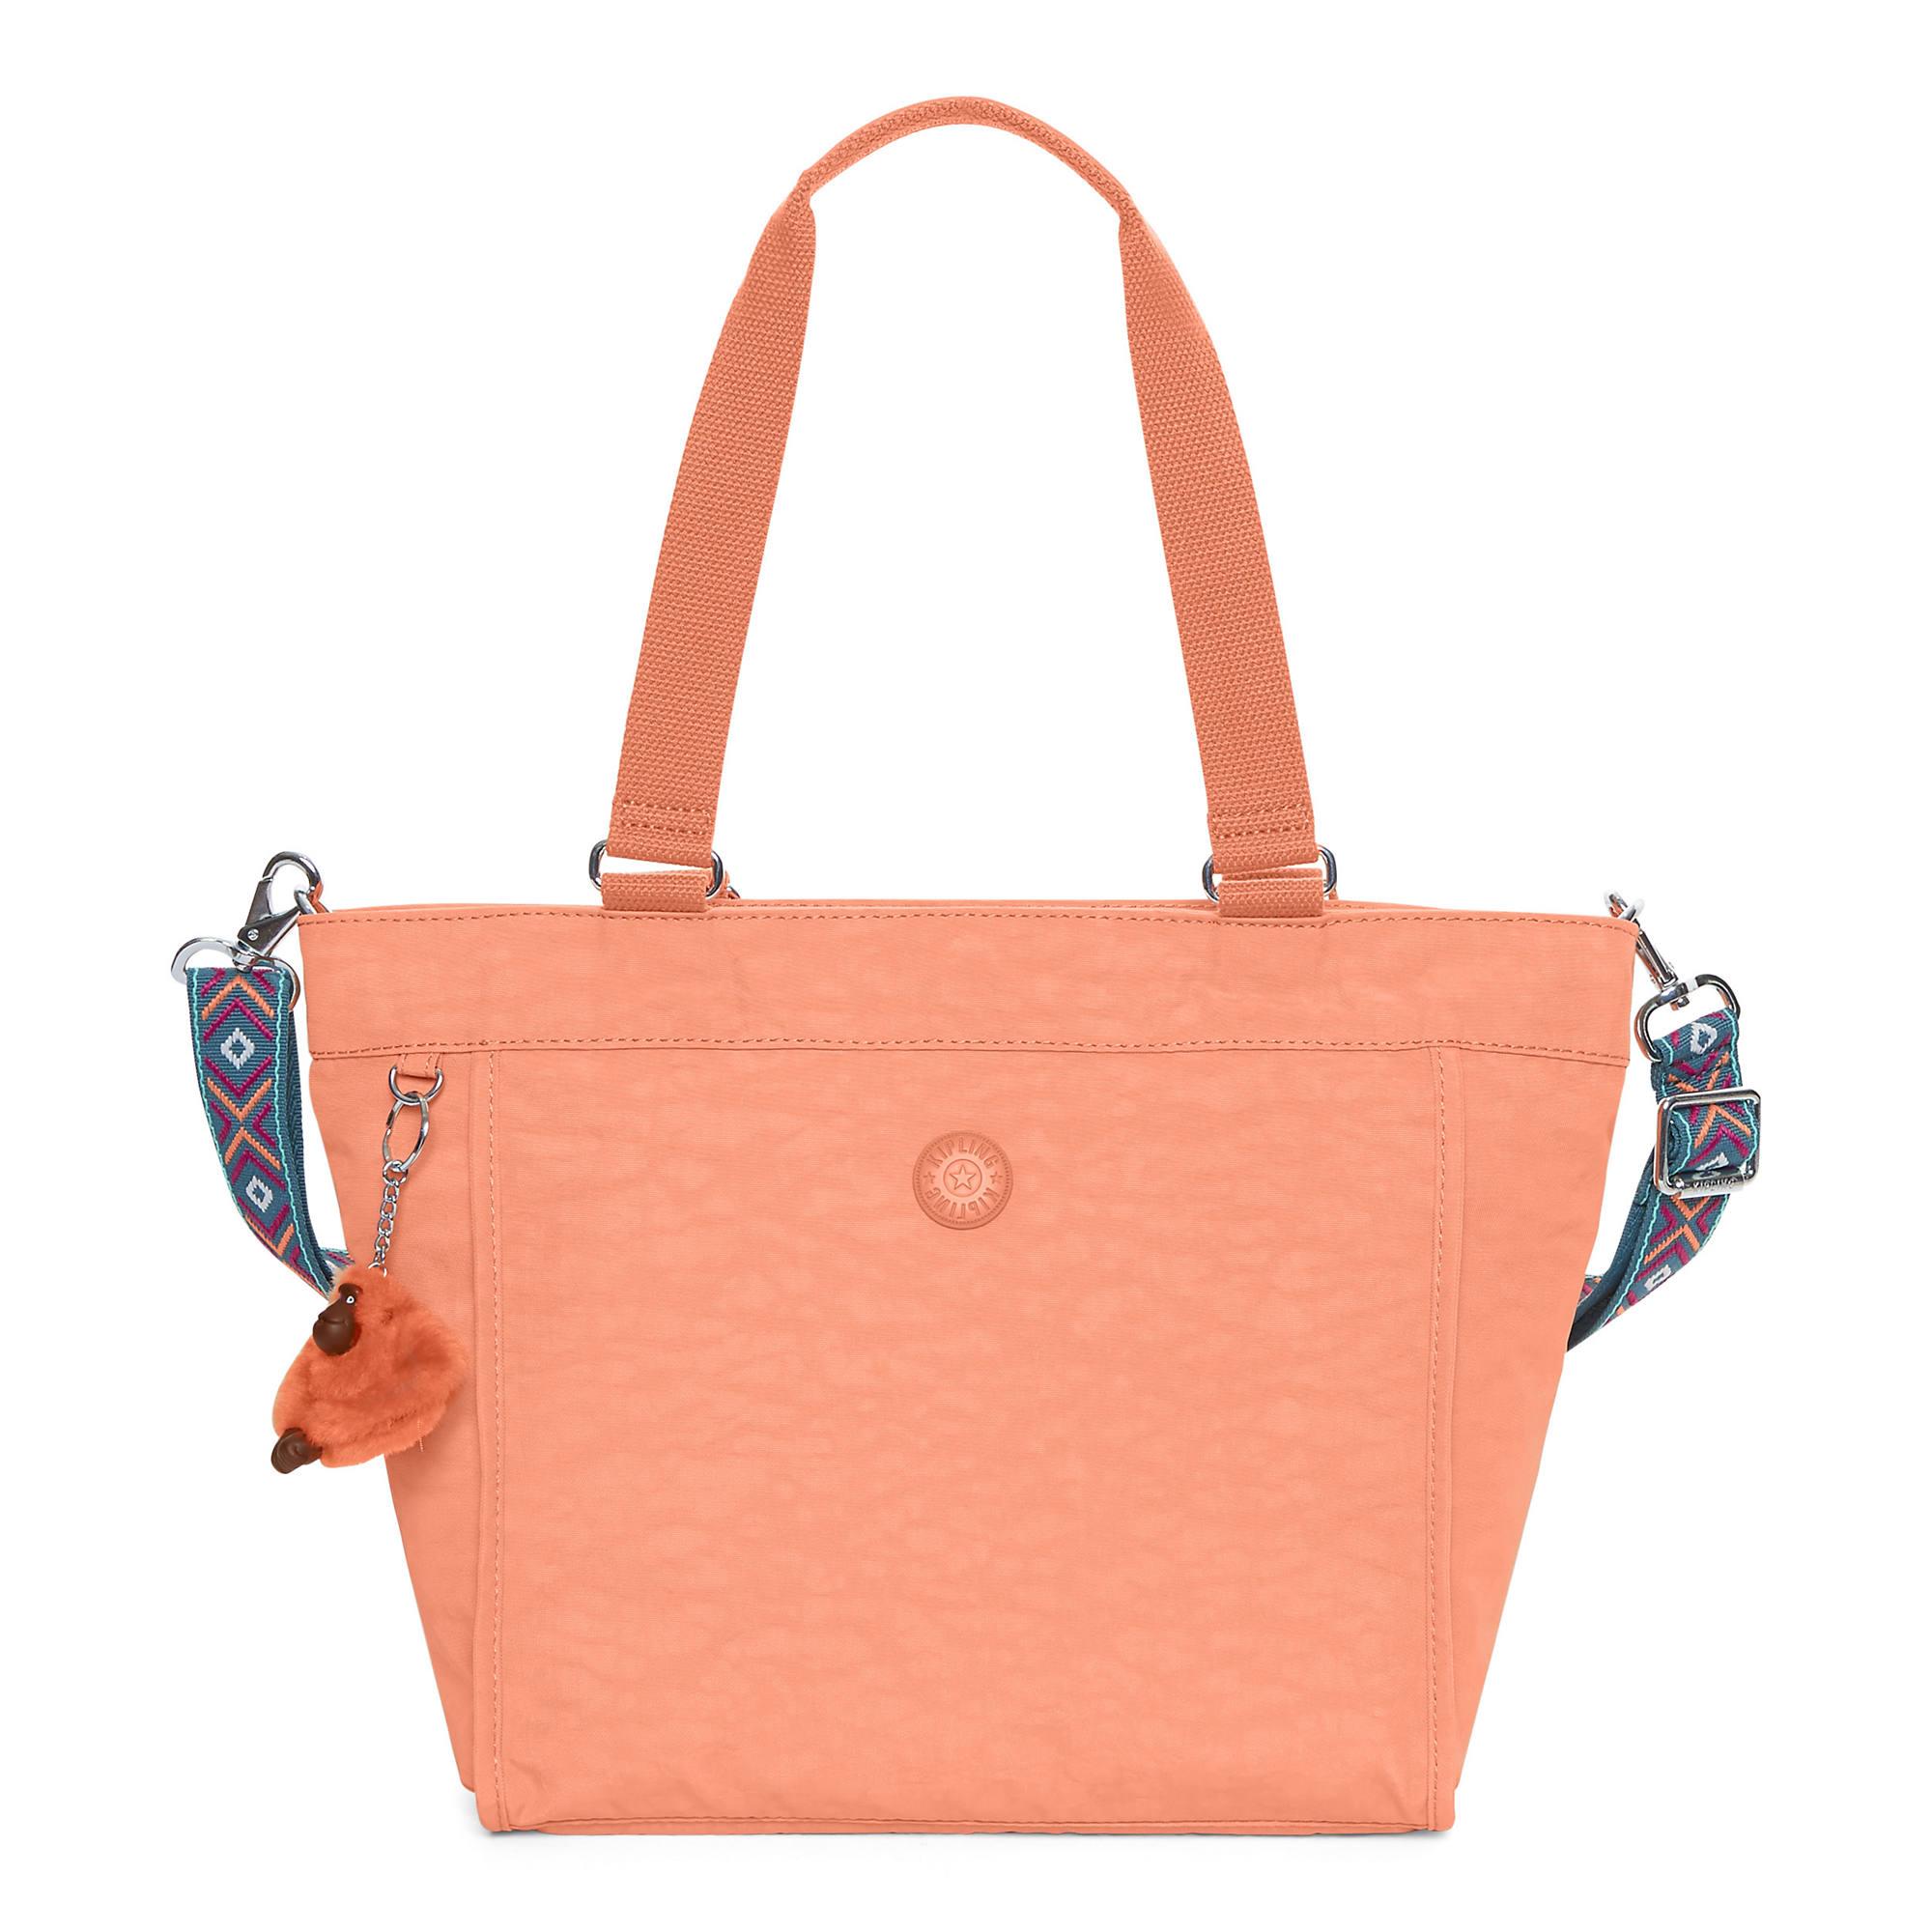 Kipling New Shopper Small Tote Bag